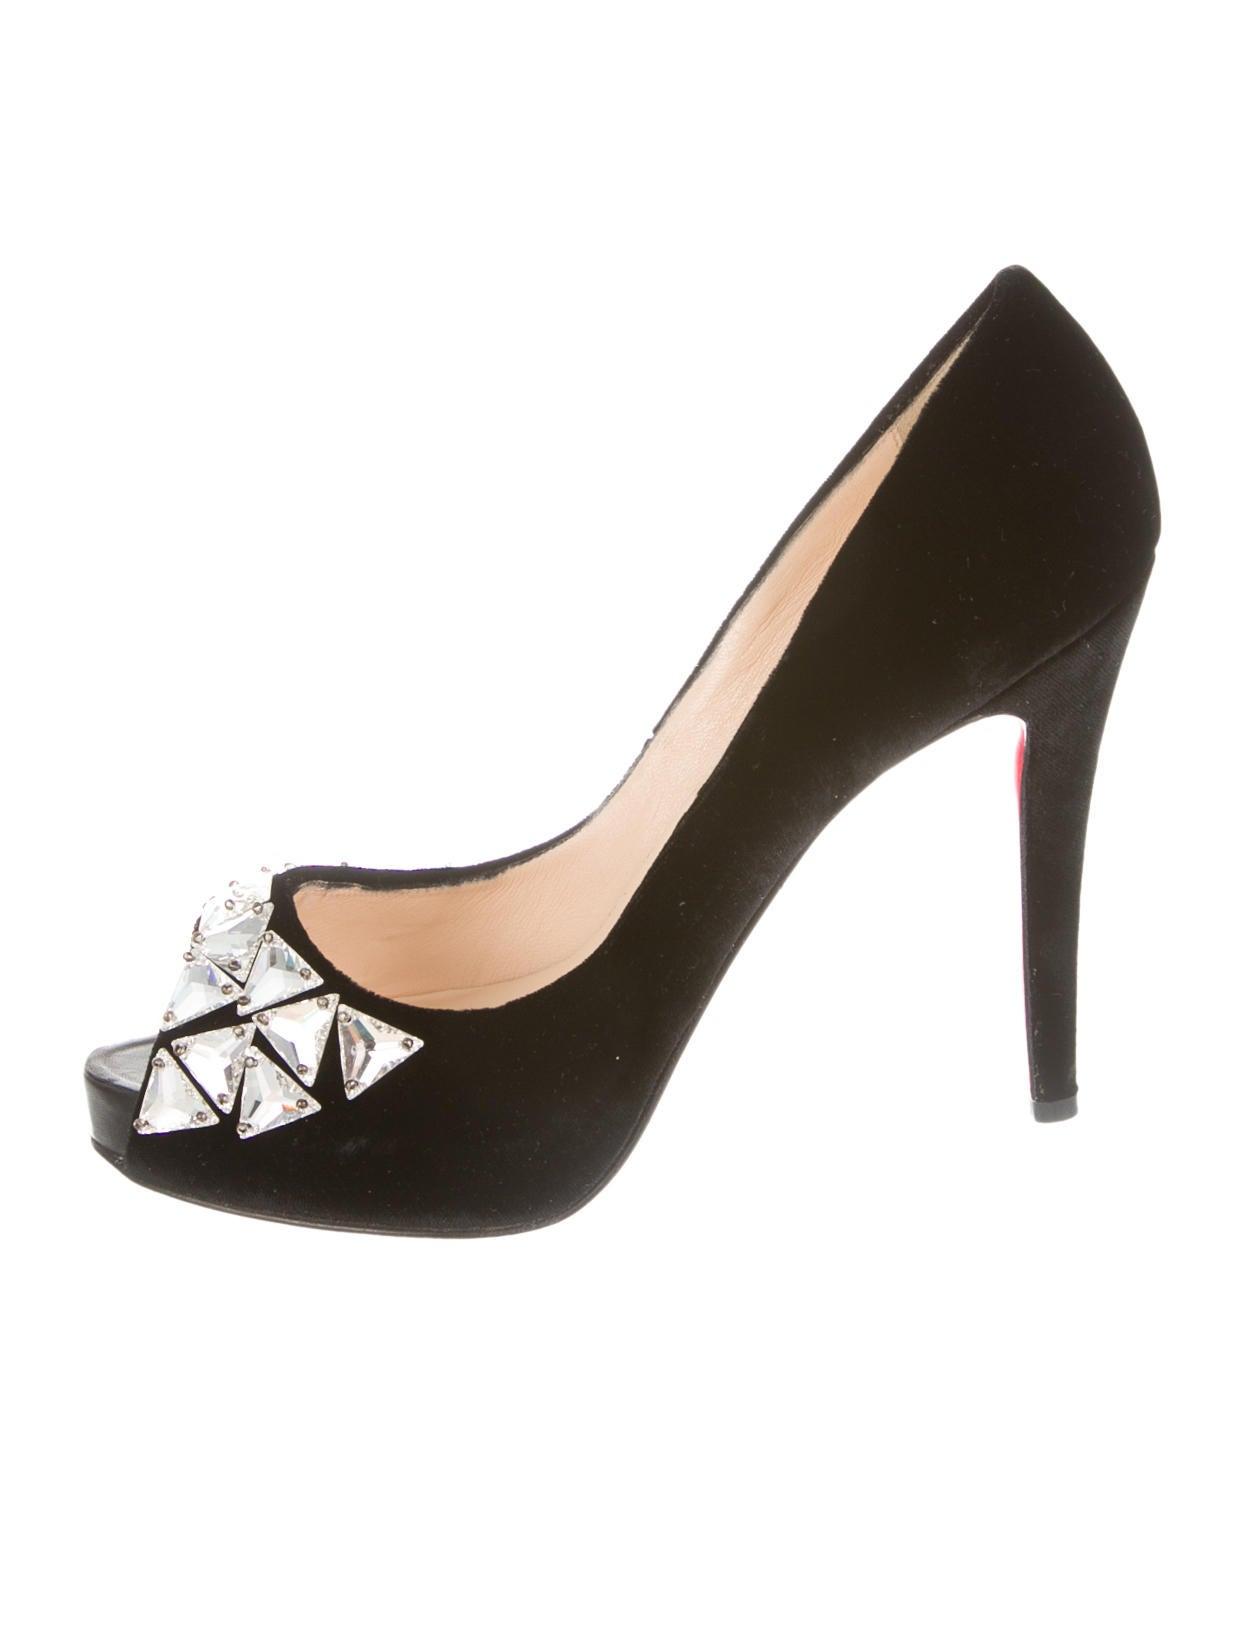 christian louboutin velvet peep-toe pumps Black jeweled adornments ...